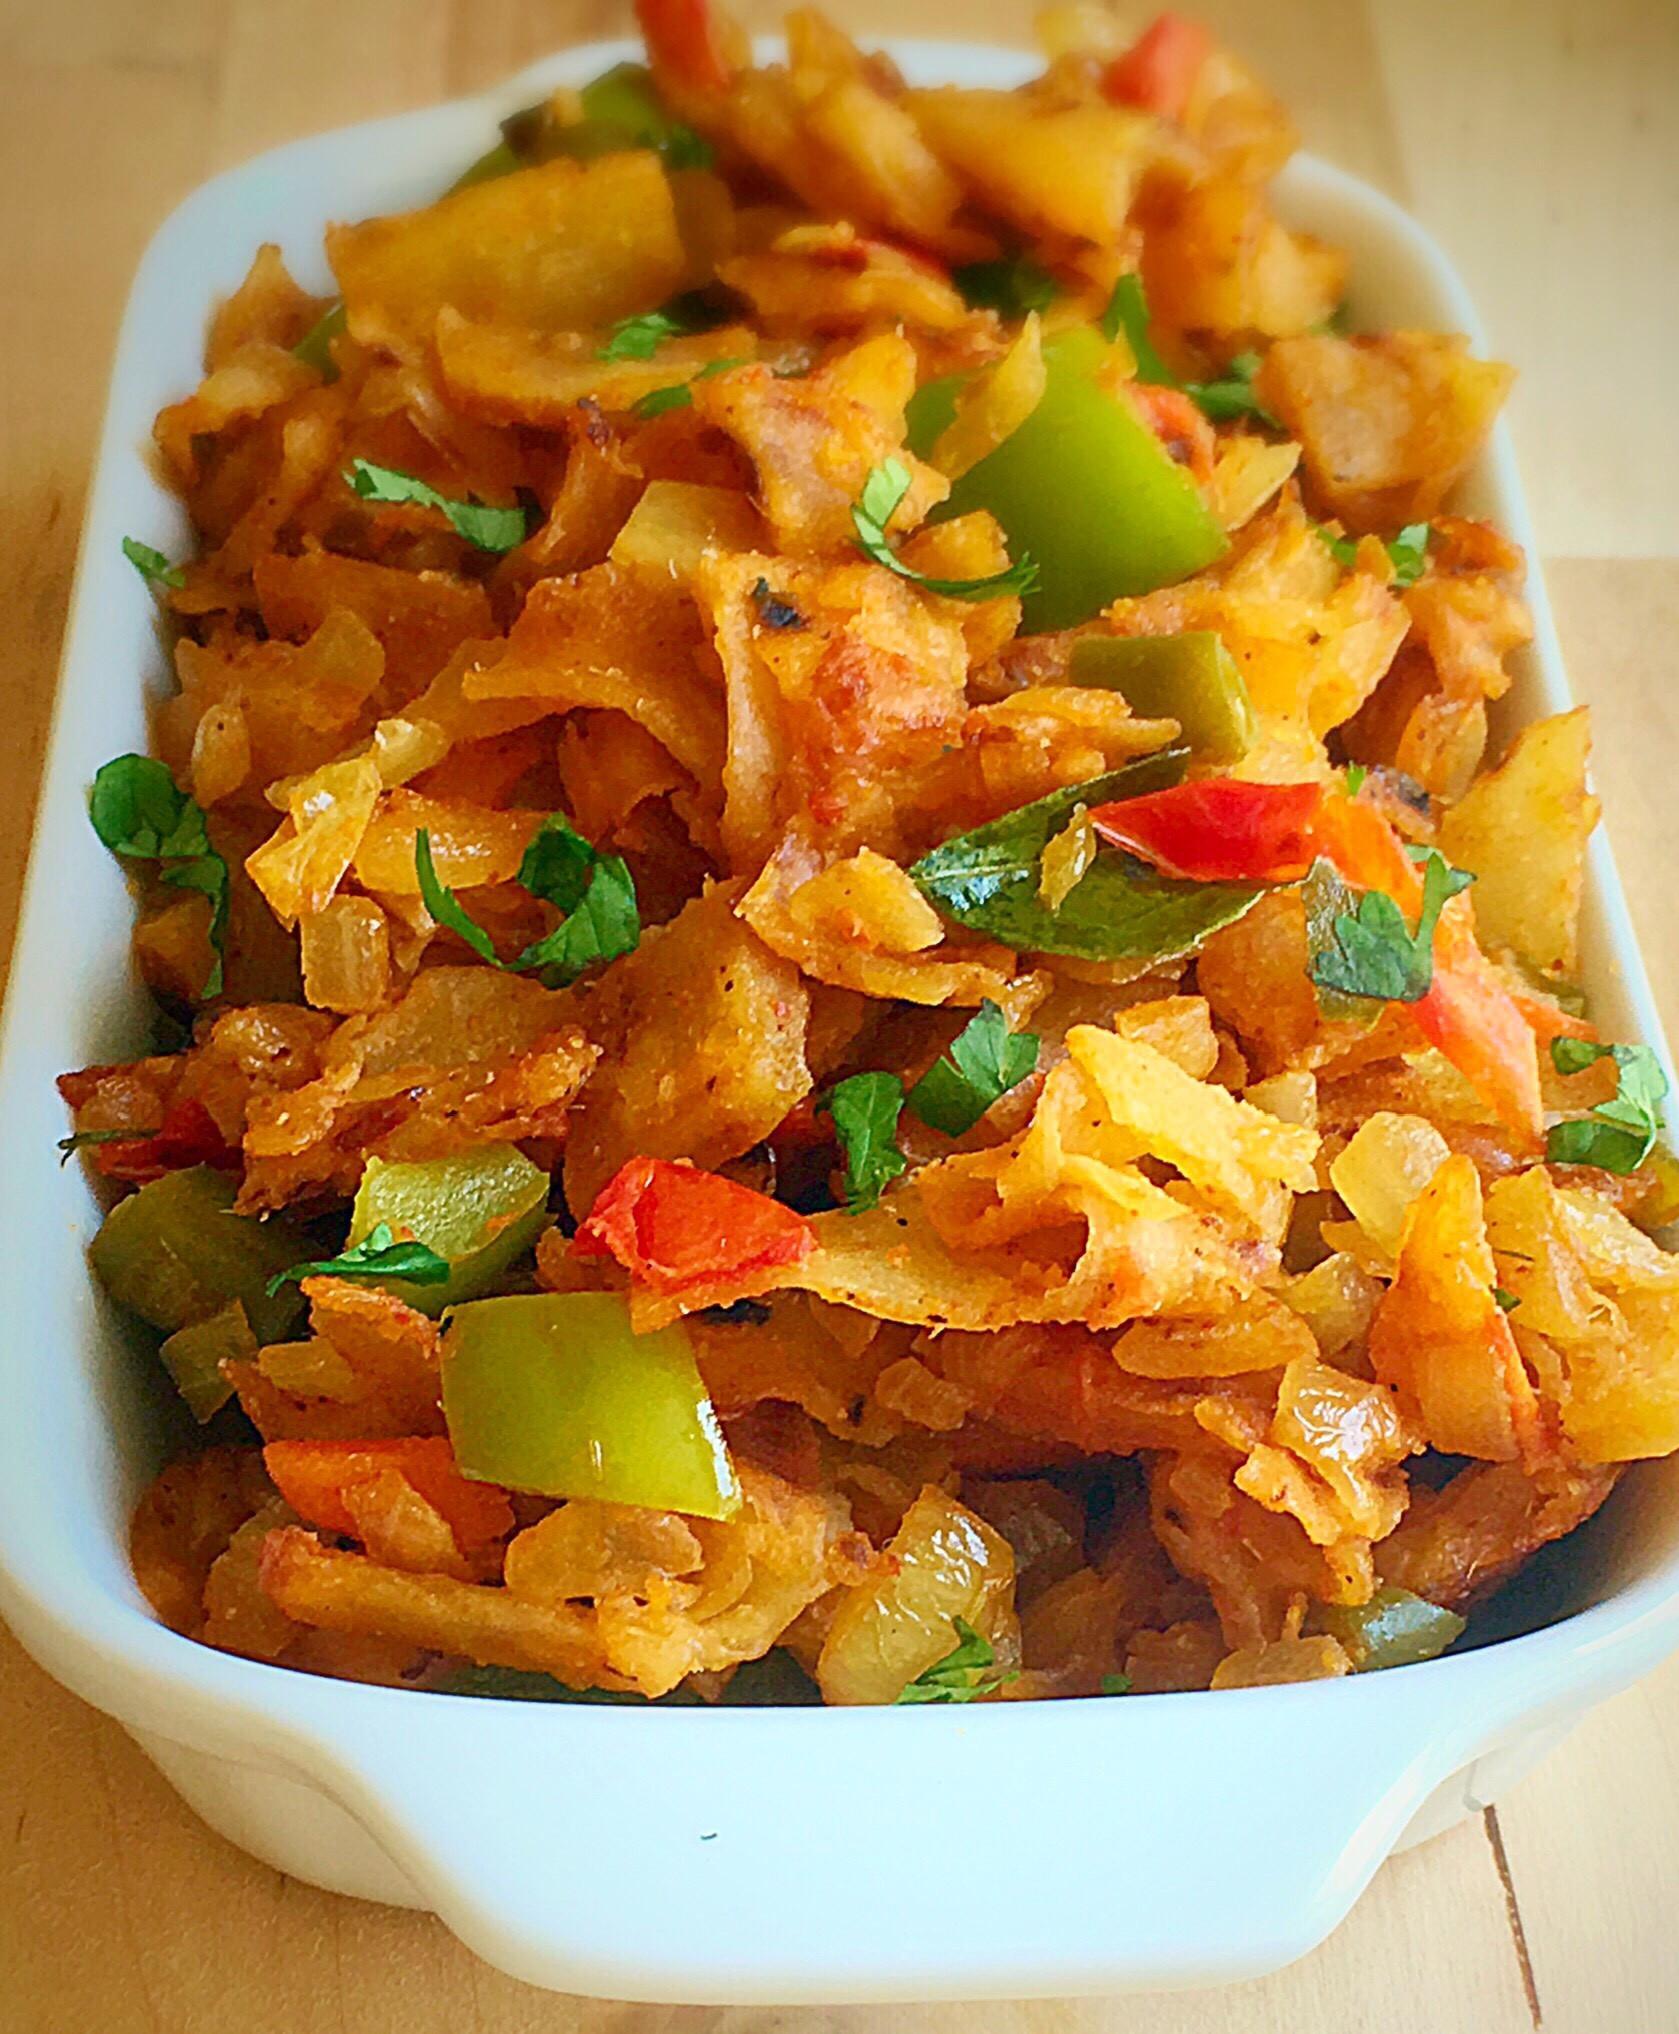 Indian Vegetarian Dinner Recipes  Veg kothu parotta recipe How to make ve able kothu